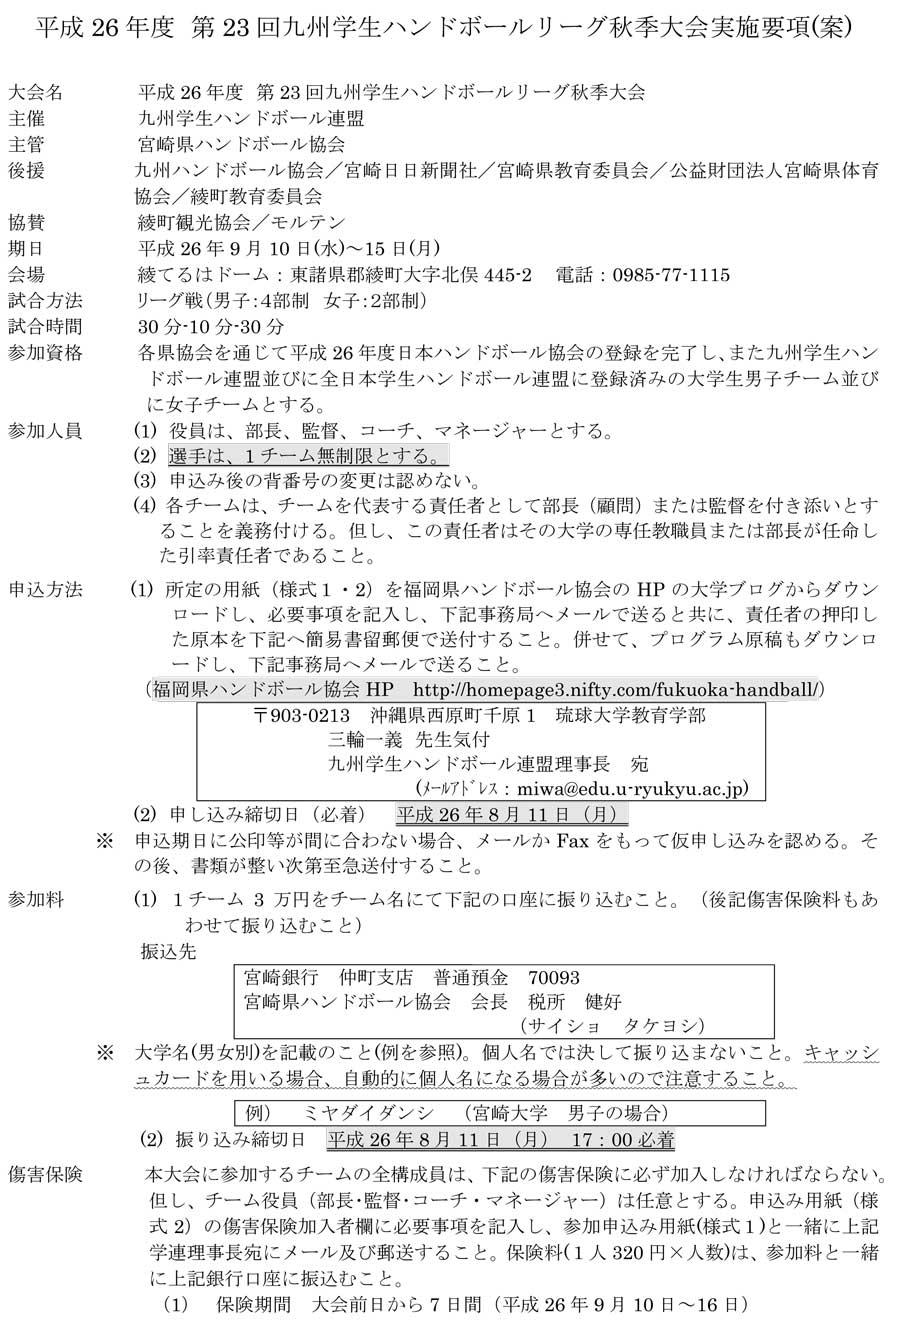 2014dai_fall_rg_youkou1